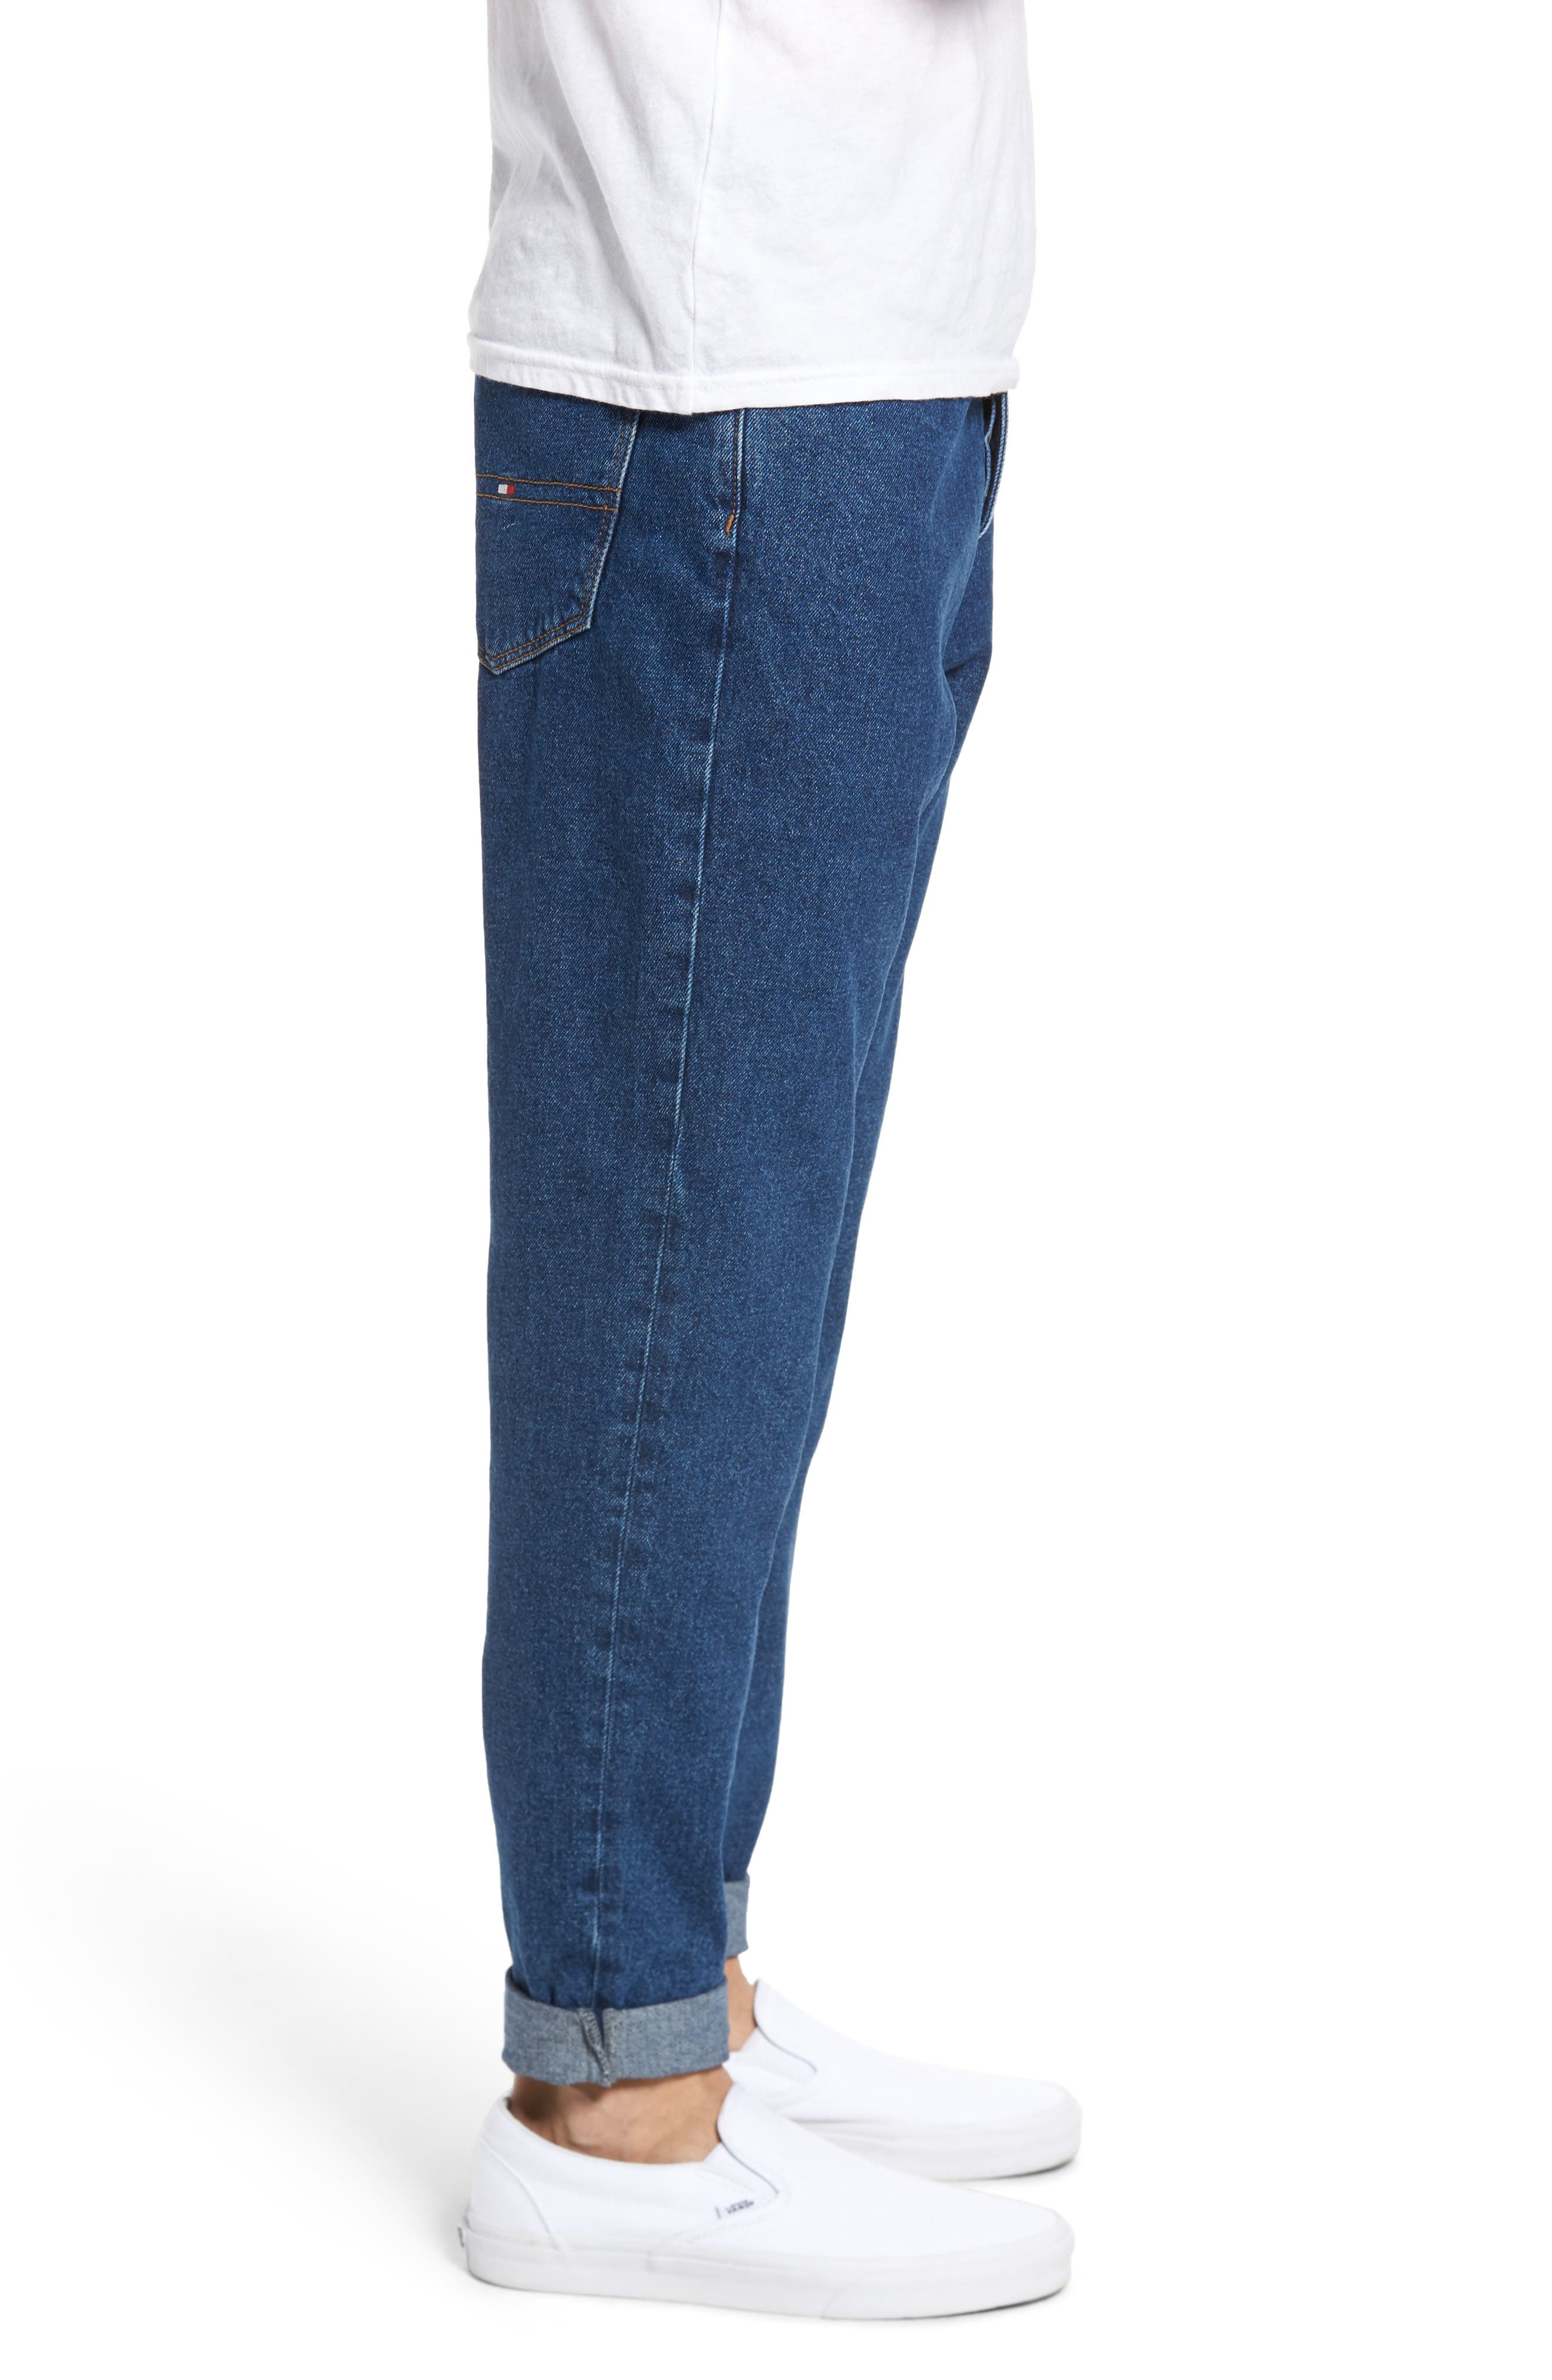 90s Classic Straight Leg Jeans,                             Alternate thumbnail 3, color,                             Denim Blue